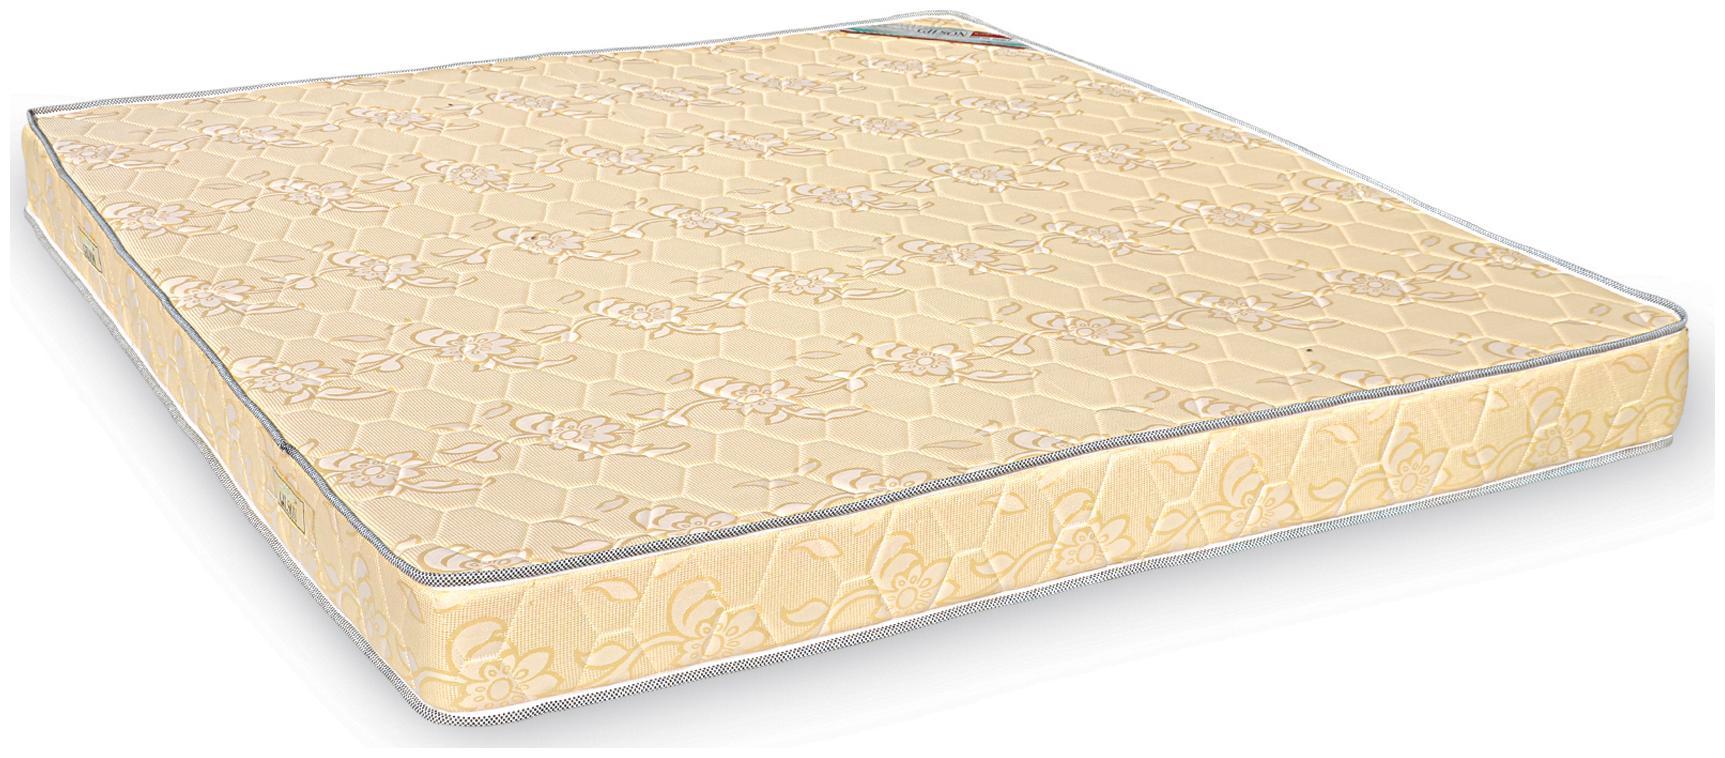 Gilson 6 inch Pocket Spring King Size Mattress by Gilson Mattresses